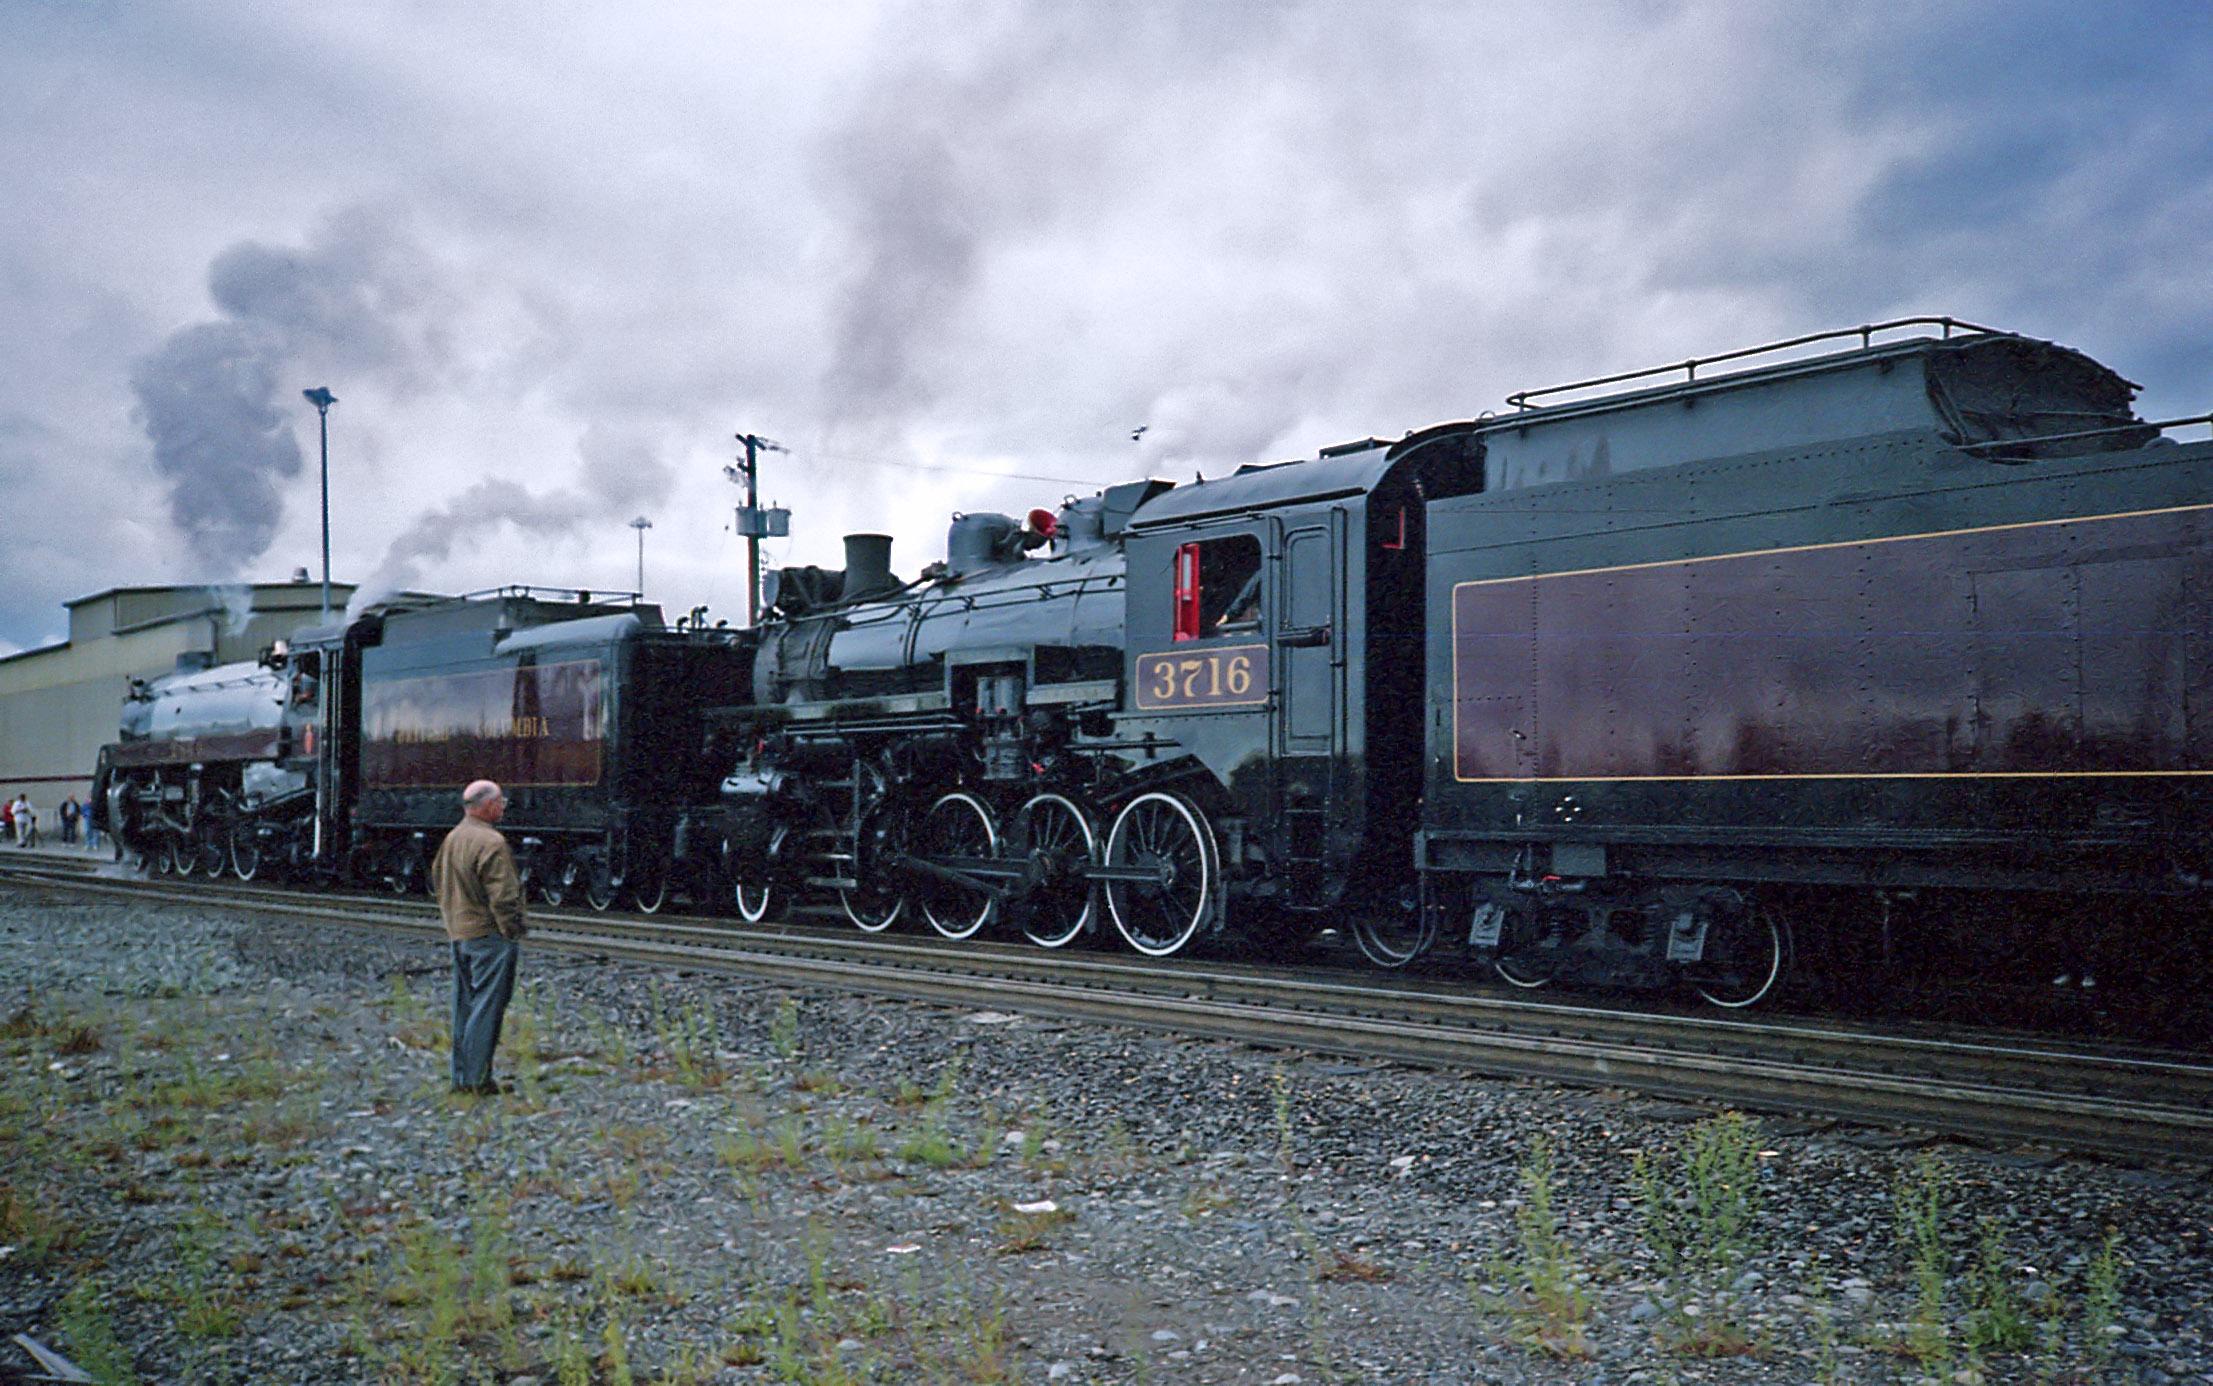 Canadian Pacific Railway CP #2860 4-6-4 steam locomotive ... Pacific Railway Company